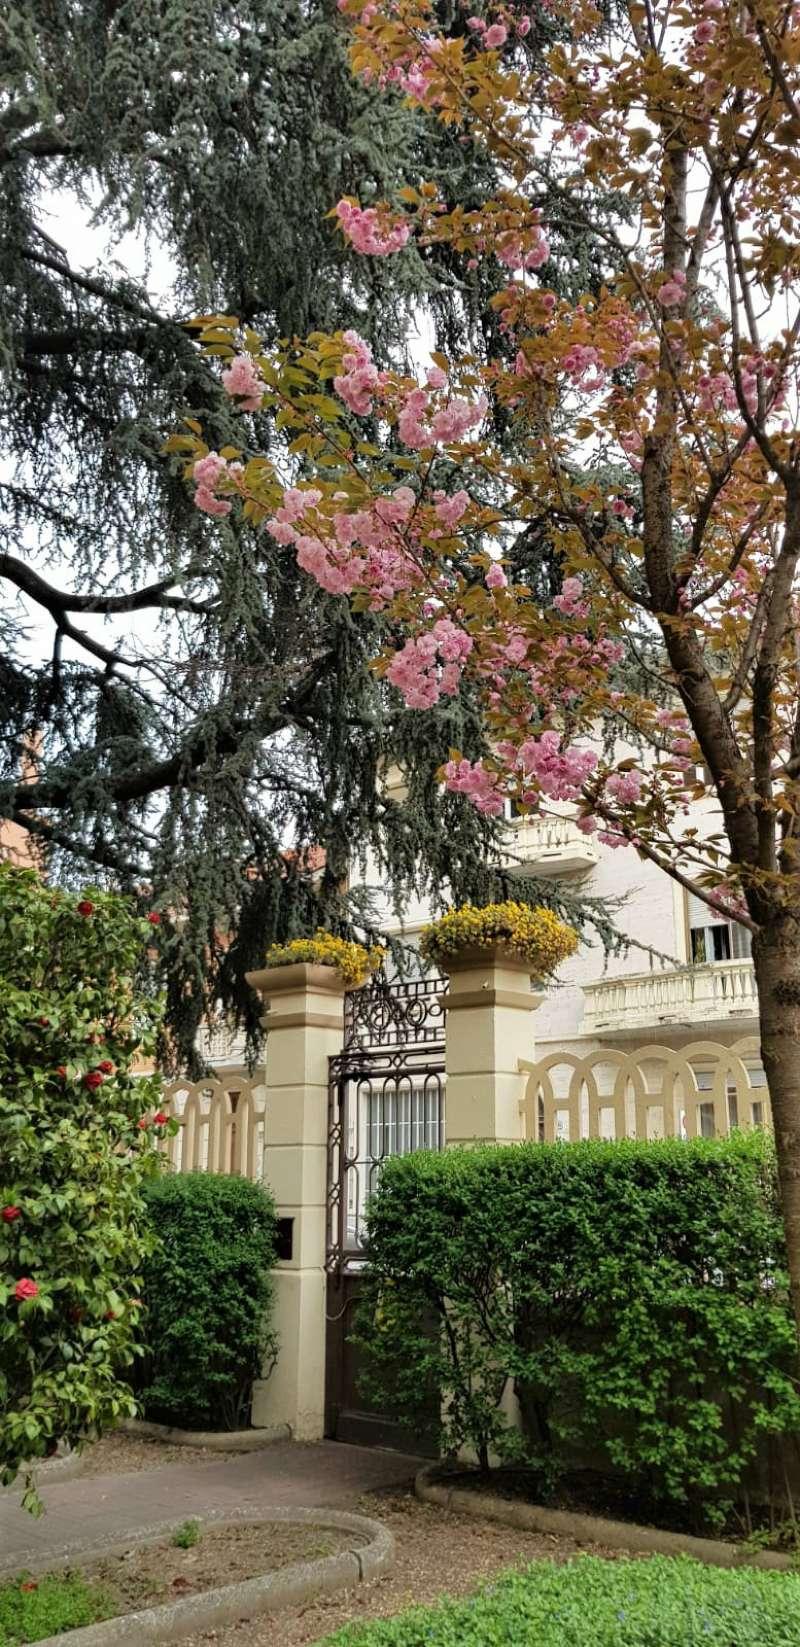 Torino Torino Affitto APPARTAMENTO » appartamentio torino